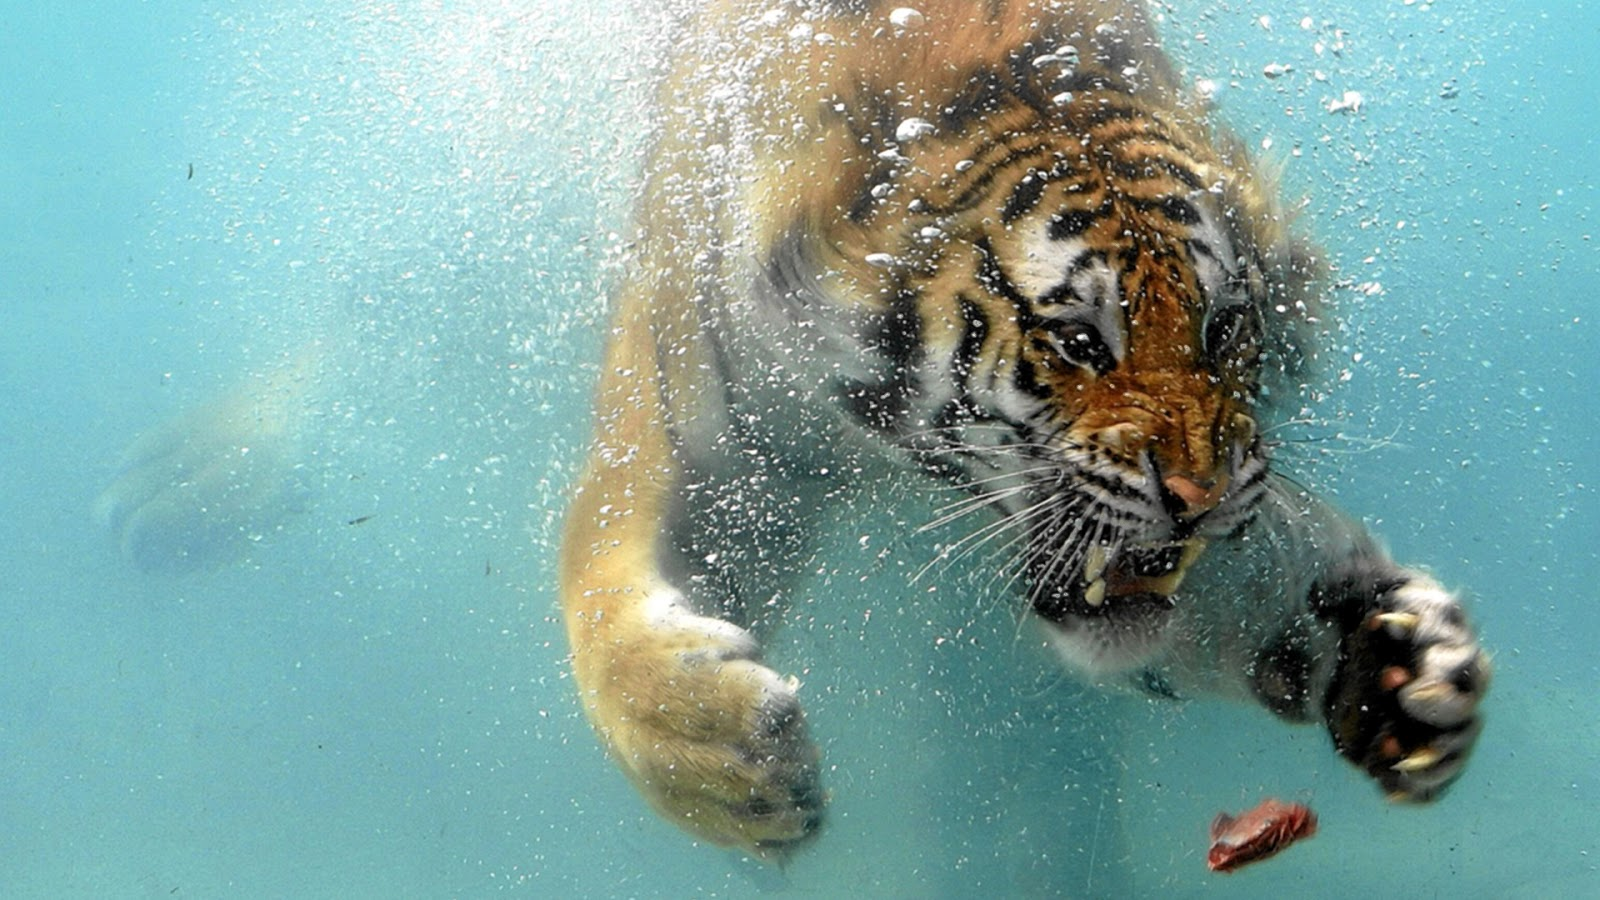 Free Download Wallpaper Hd White Tiger Beautiful Tiger Hd Tiger